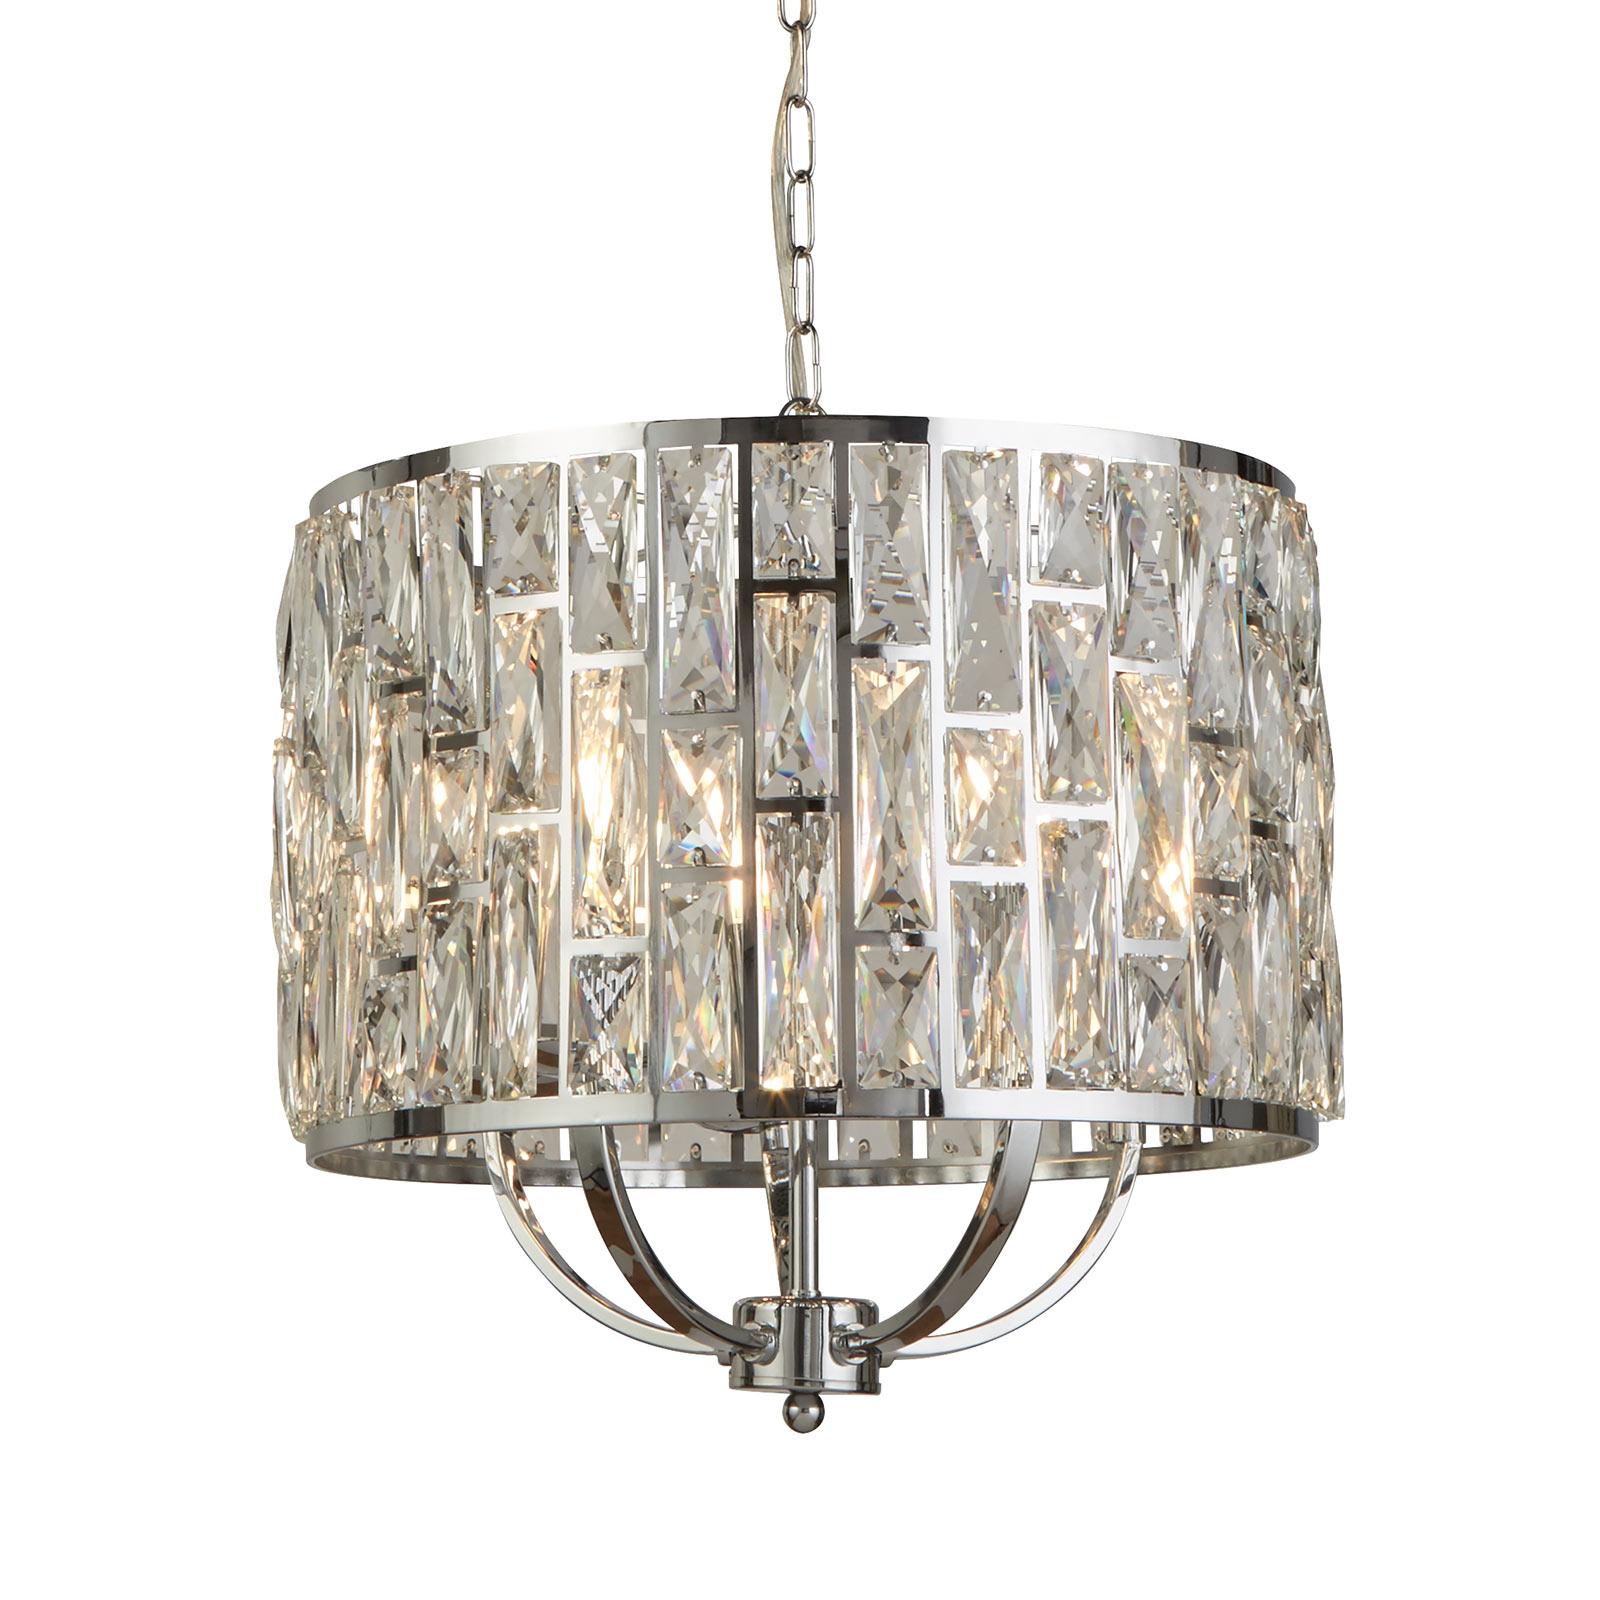 Hanglamp Bijou met kristalglaskap, Ø 44 cm